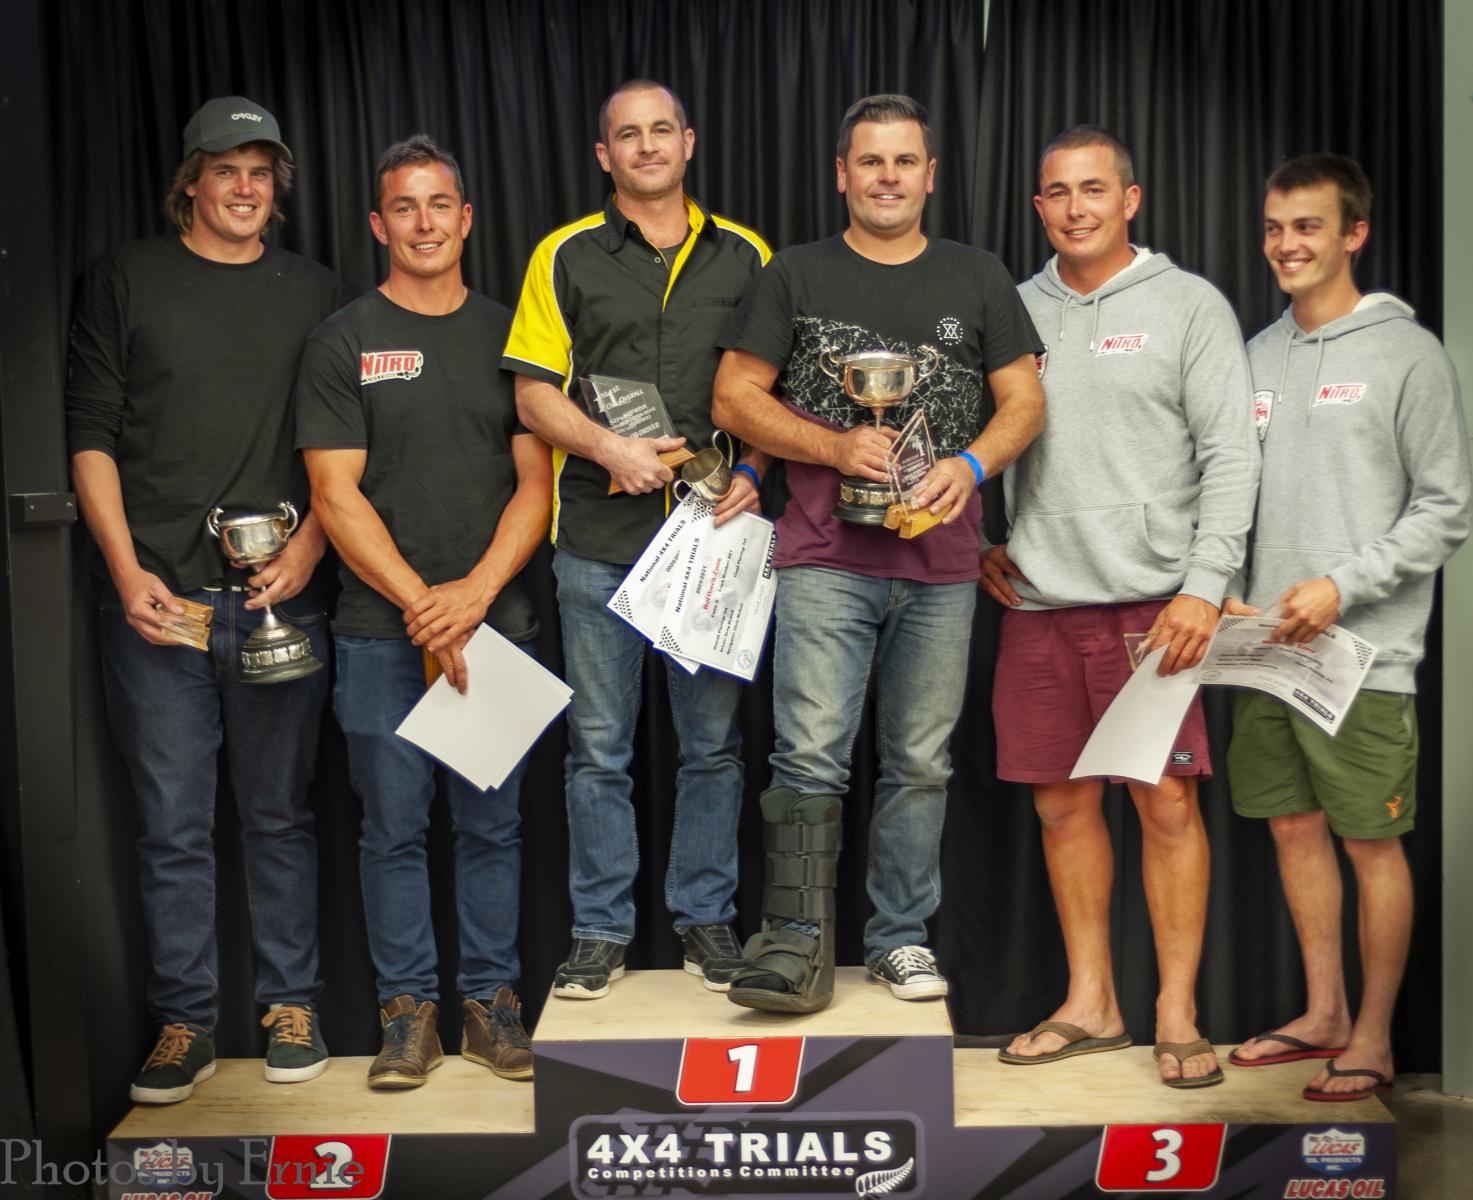 D Class: 2nd Sam Thomsen & Scott Biggs, 1st Greg & Chris McDell, 3rd Jarred Biggs & Fleche Crawford